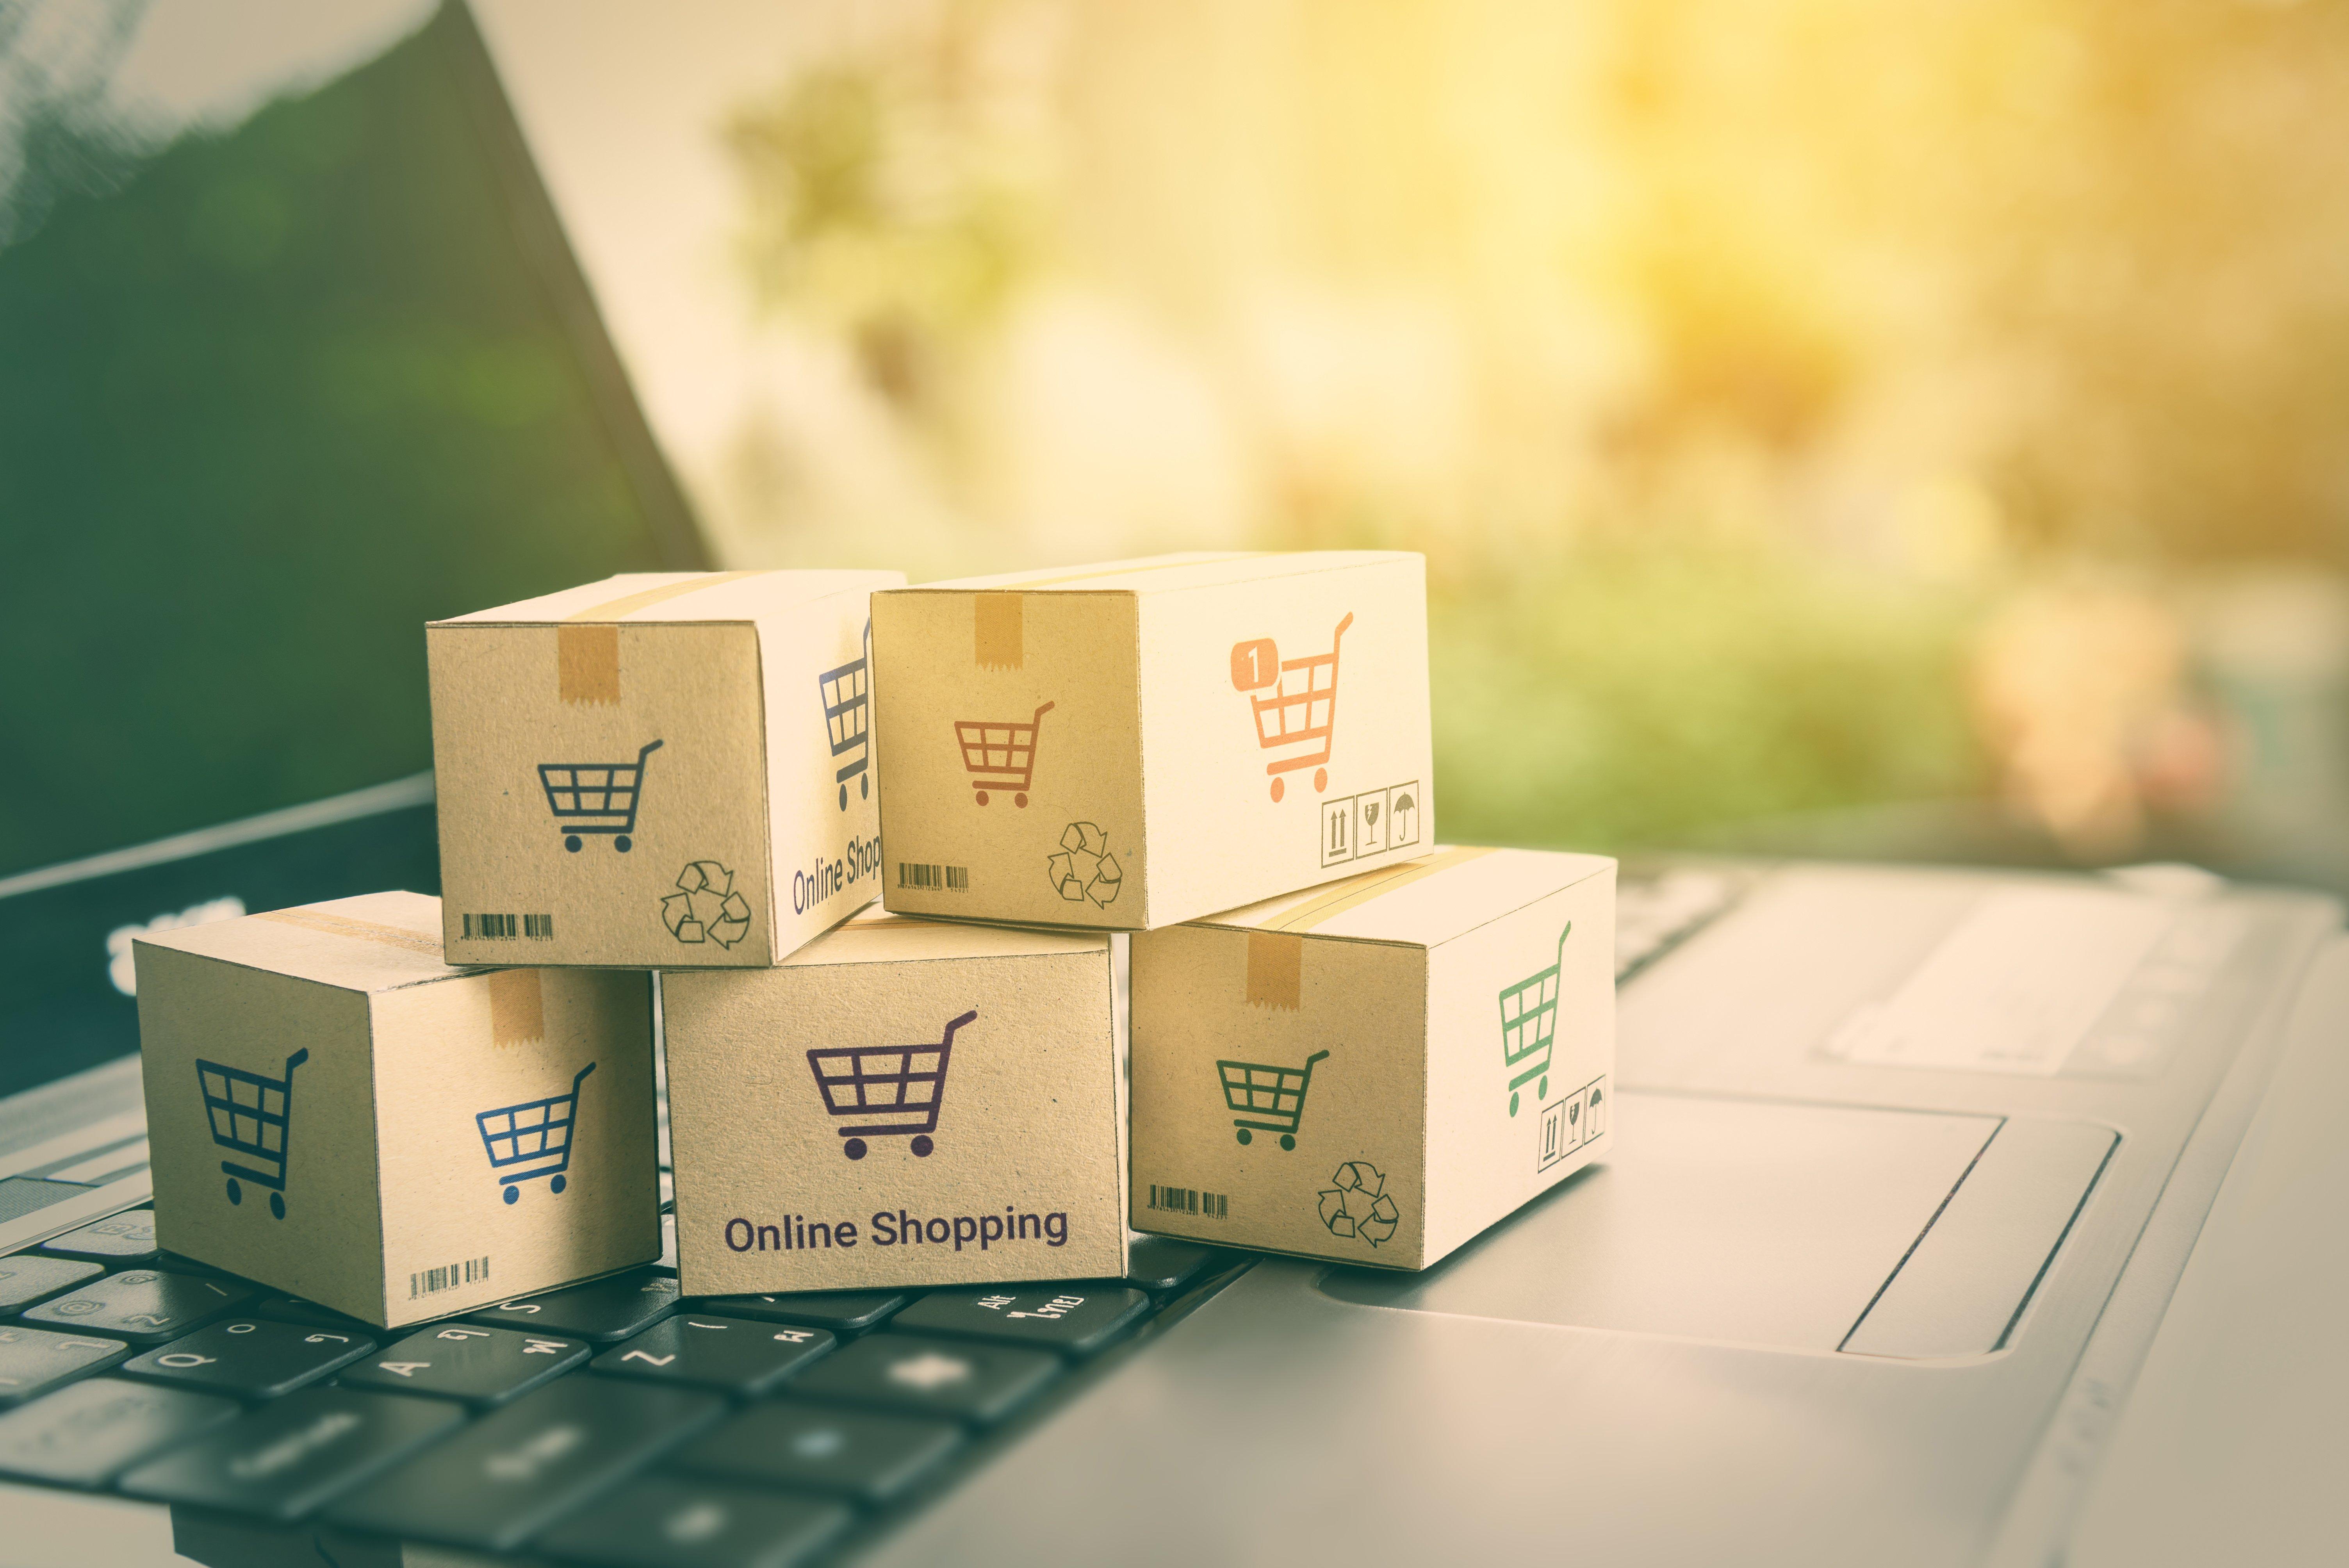 E-commerce Working Capital